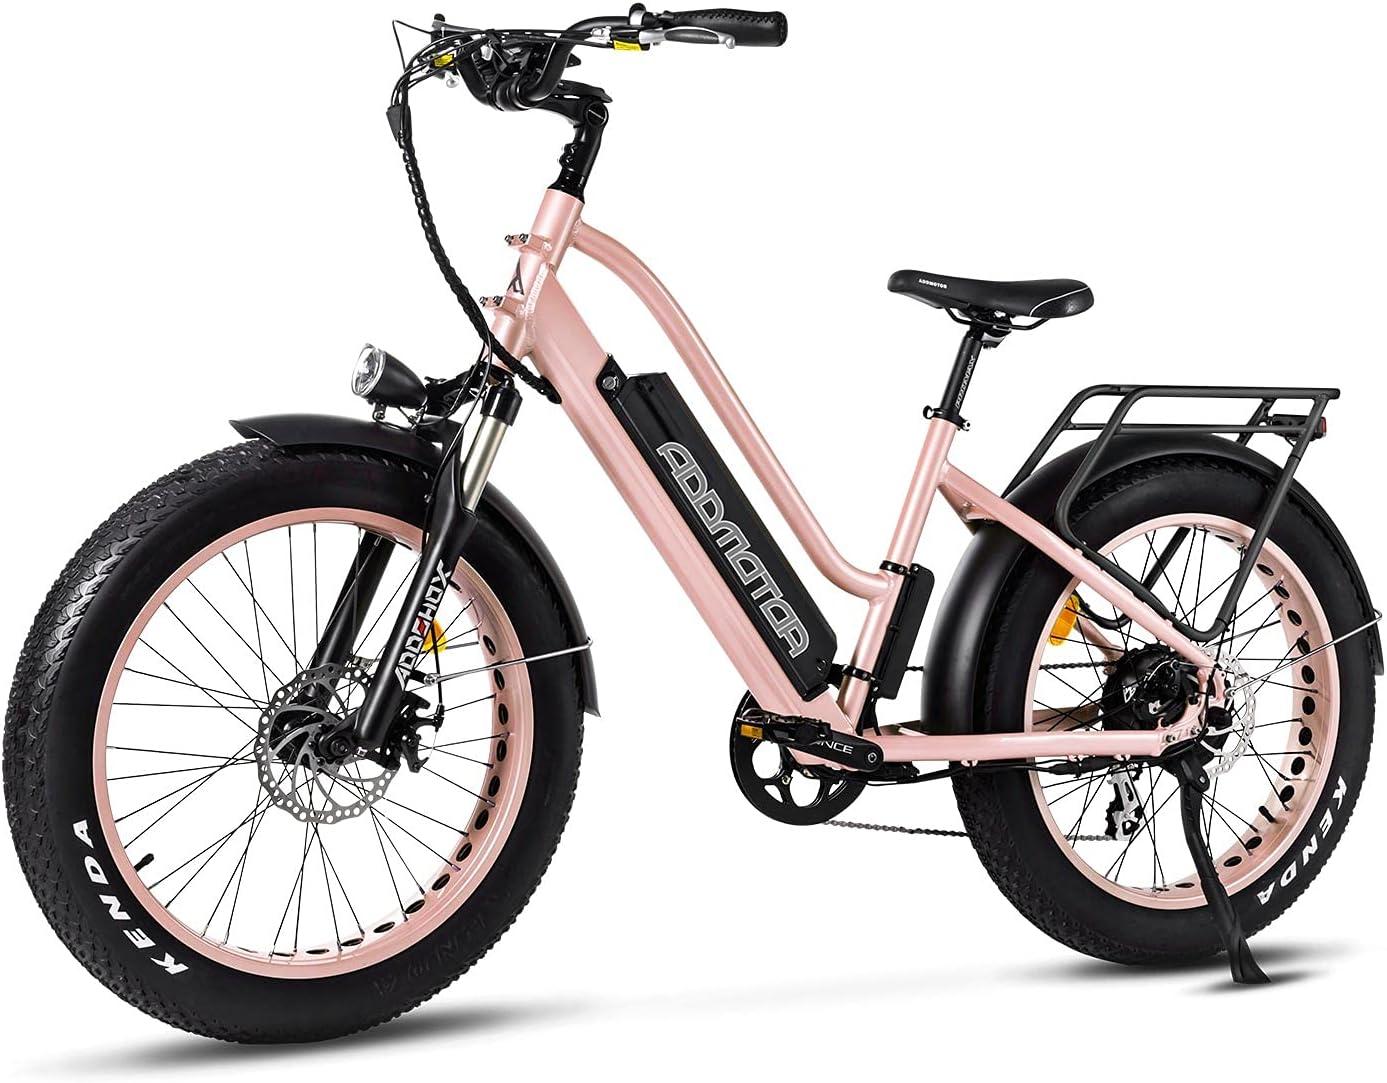 Addmotor Motan Step-Thru 70% OFF Outlet Electric Bike 28MPH Tire 24